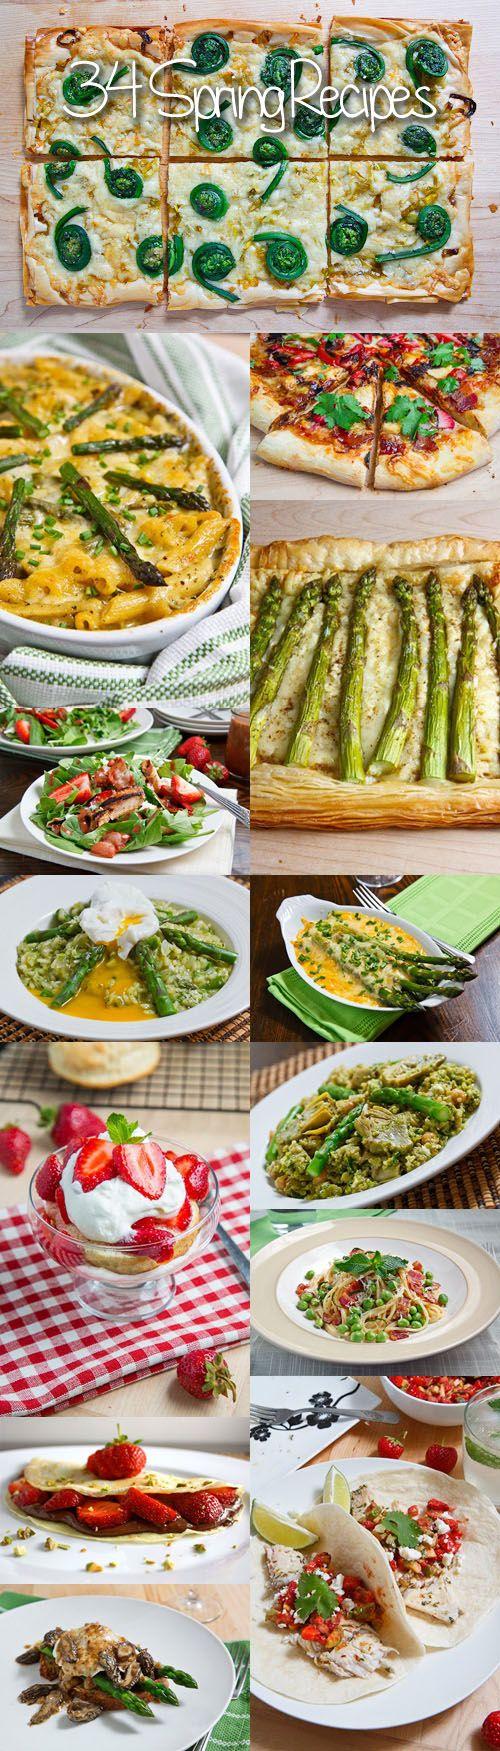 34 Spring Recipes:  Strawberries, Asparragus, Artichokes, Wild Leeks (Ramps), Morel Mushroooms, Fiddleheads, Peas, Rhubarb